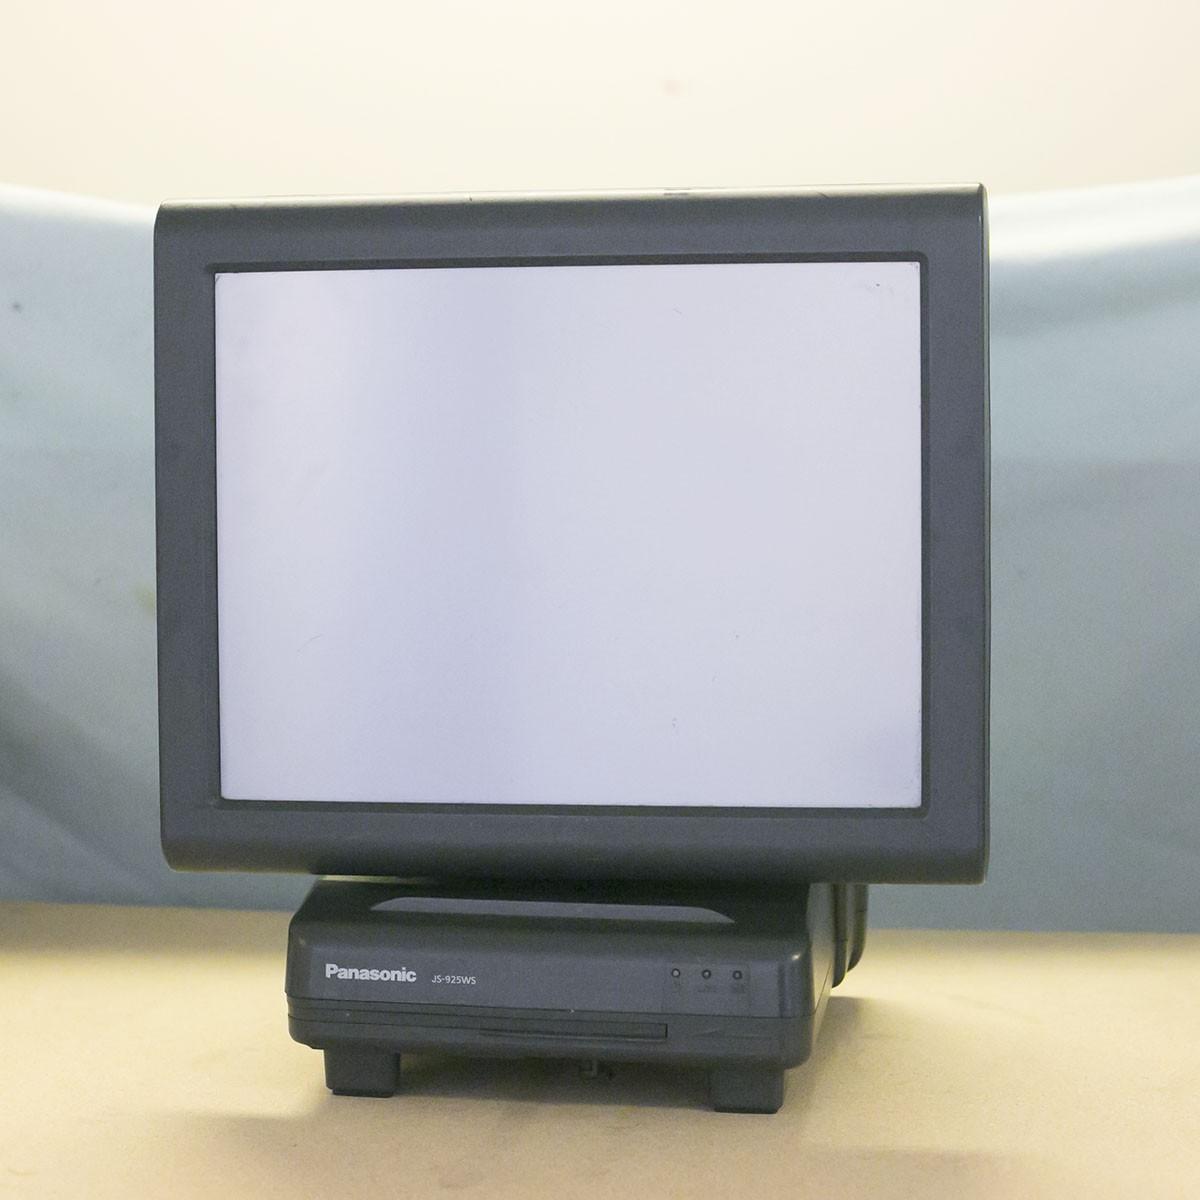 Dator Panasonic JS-925 - FYNDVARA